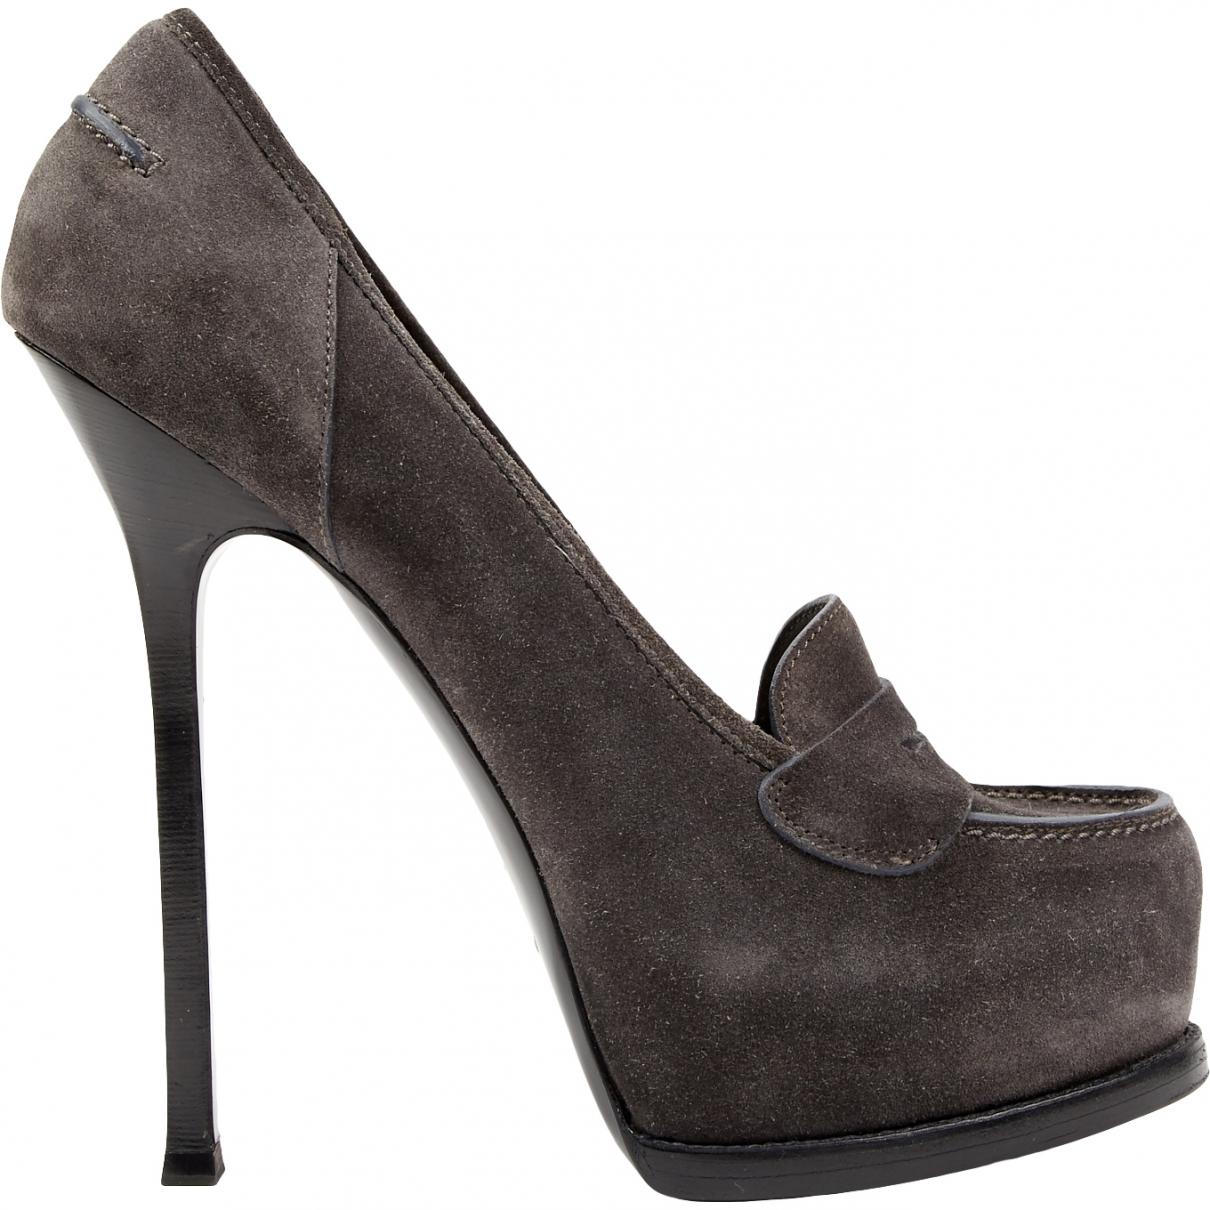 Yves Saint Laurent \N Grey Suede Heels for Women 40 EU